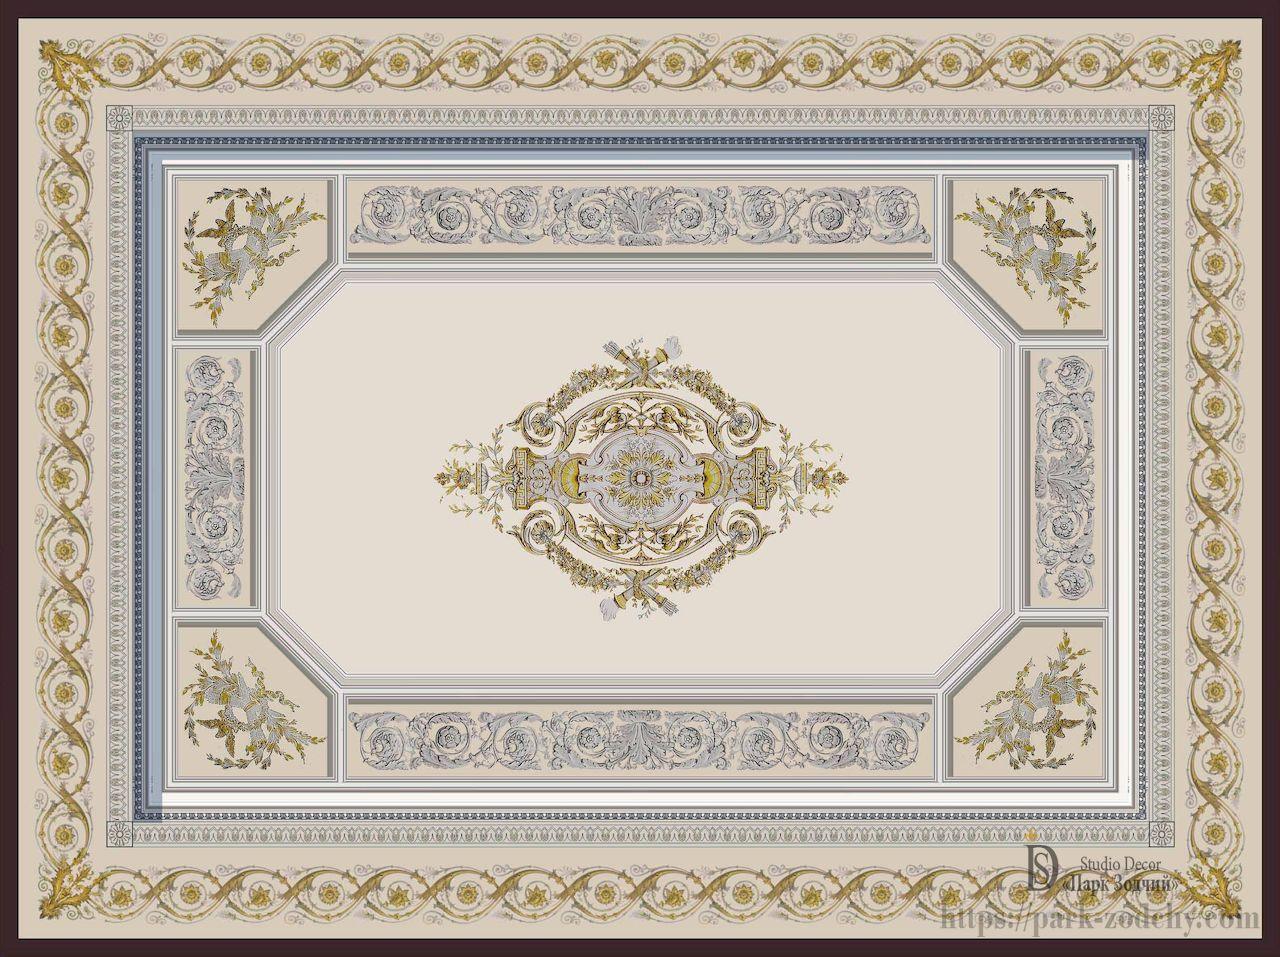 Exquisite painted ceiling